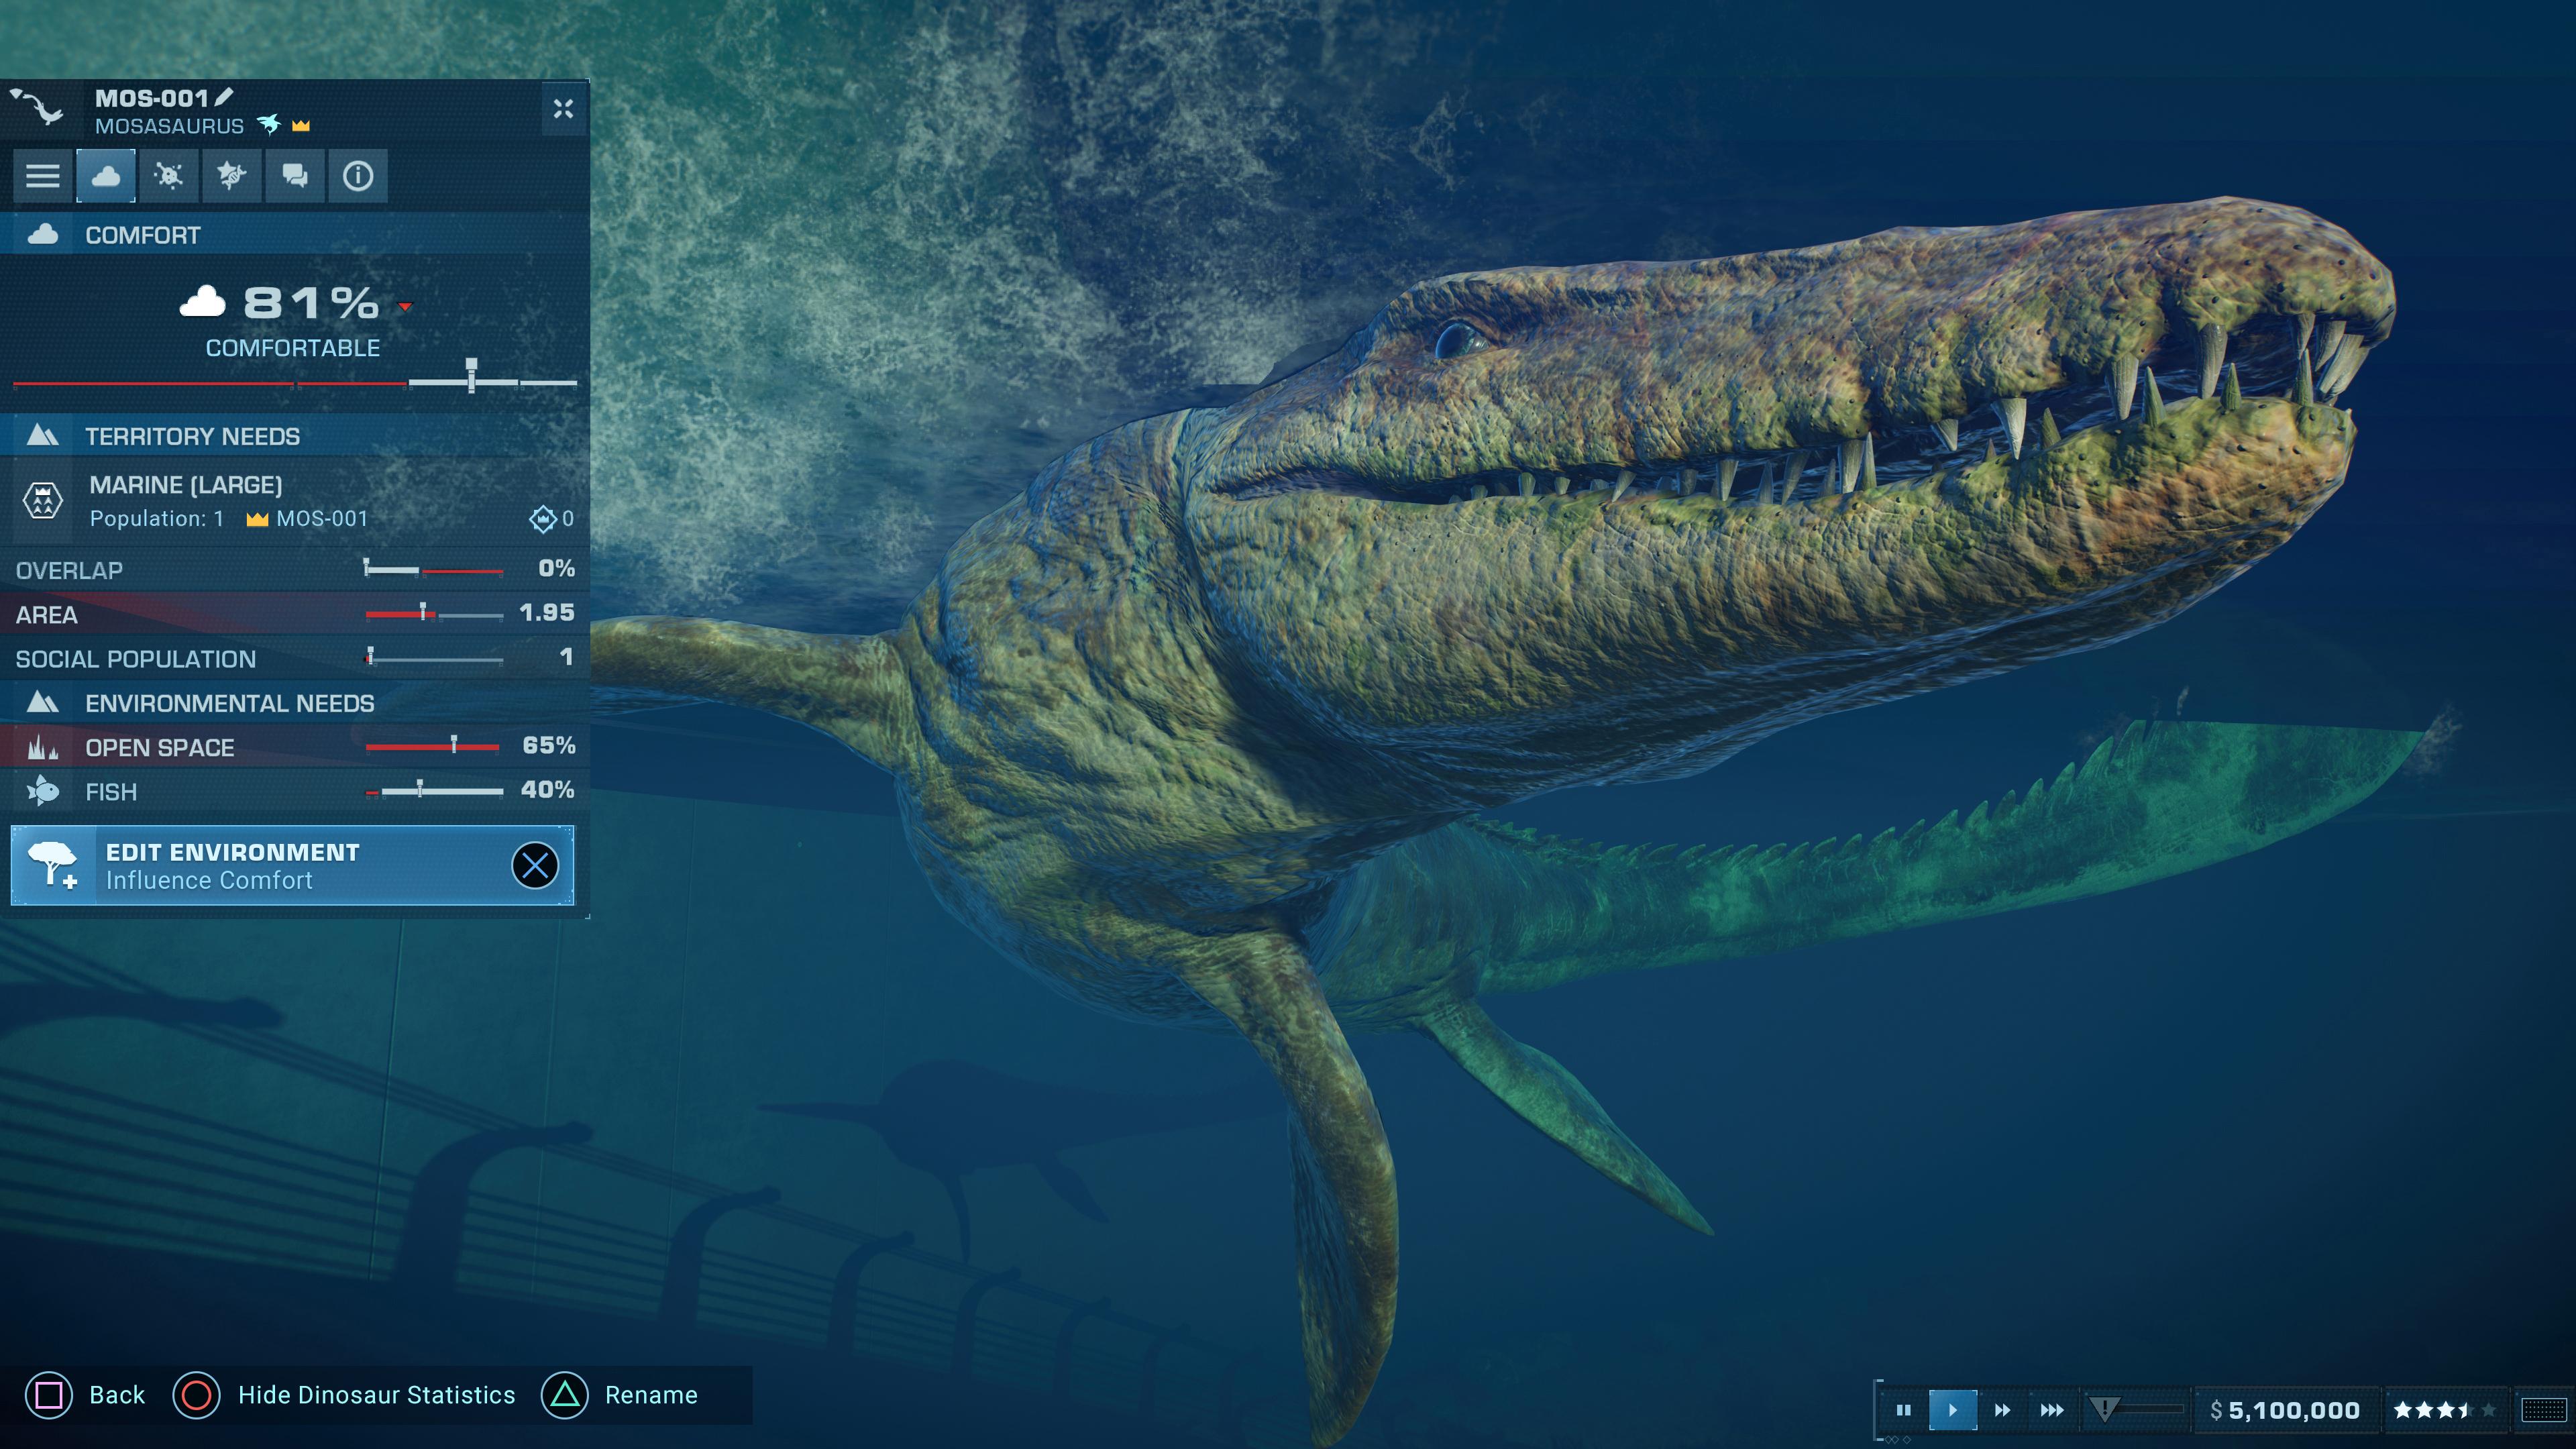 Скриншот №2 к Jurassic World Evolution 2 PS4 and PS5